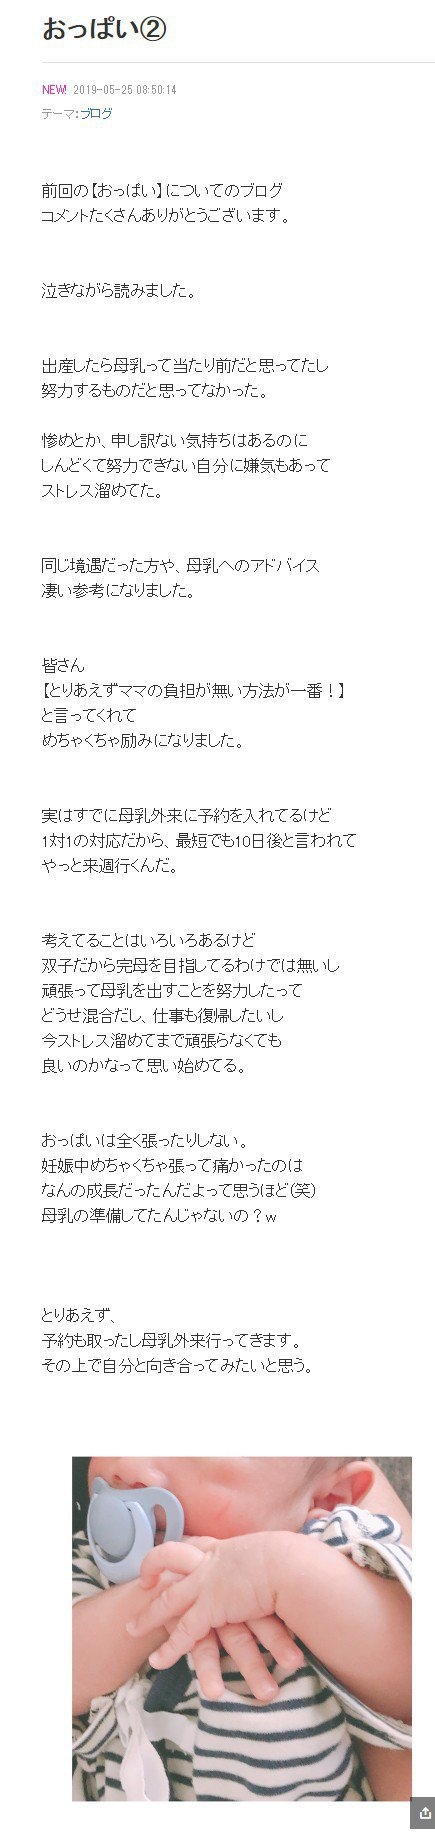 圖/擷自ameblo.jp。